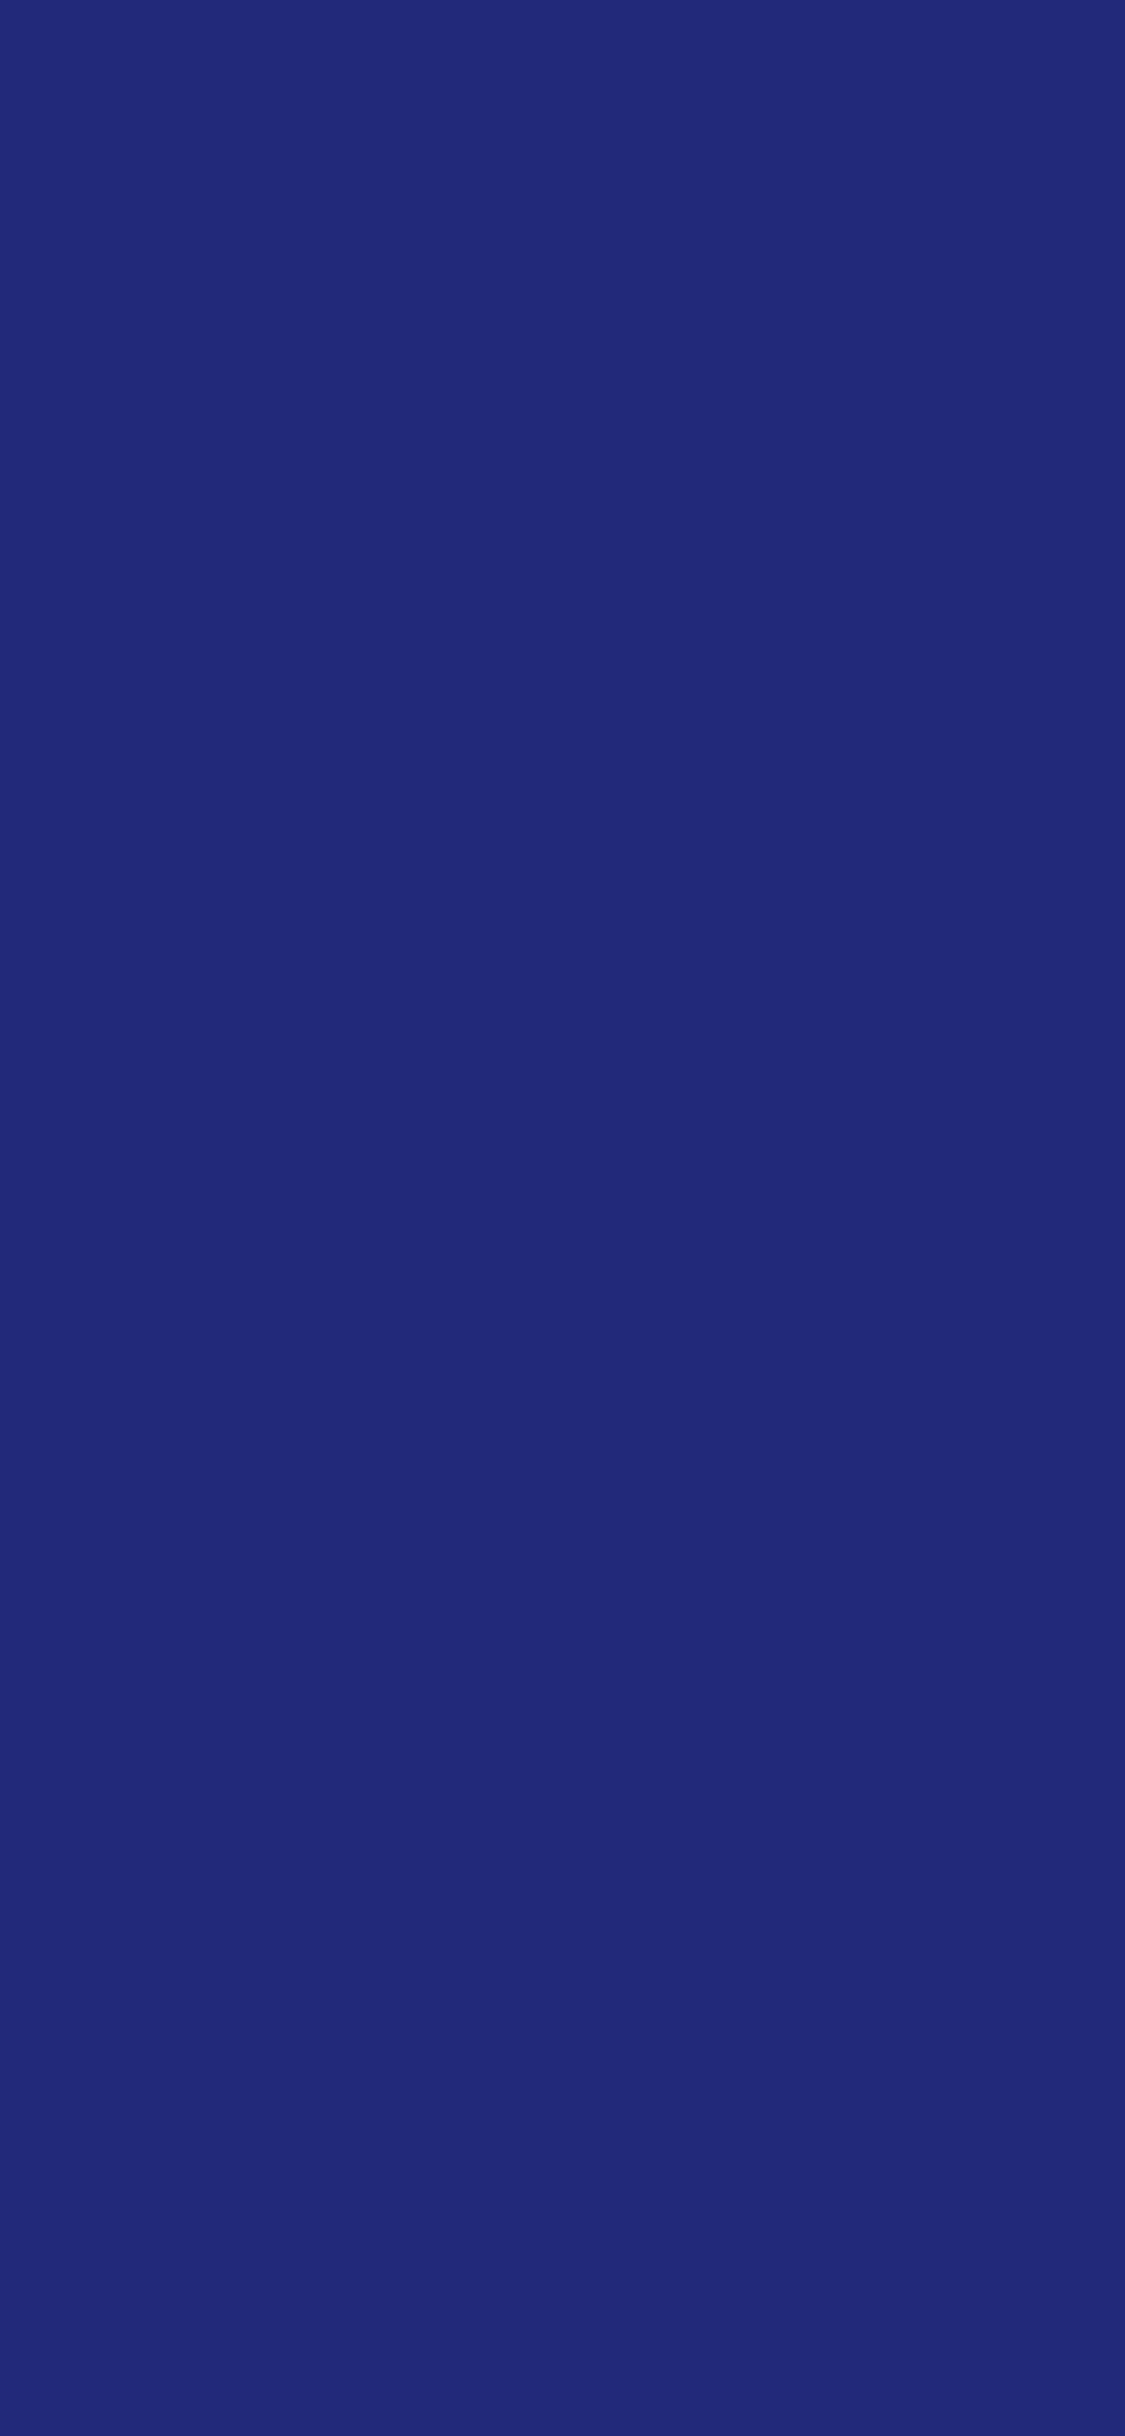 1125x2436 St Patricks Blue Solid Color Background